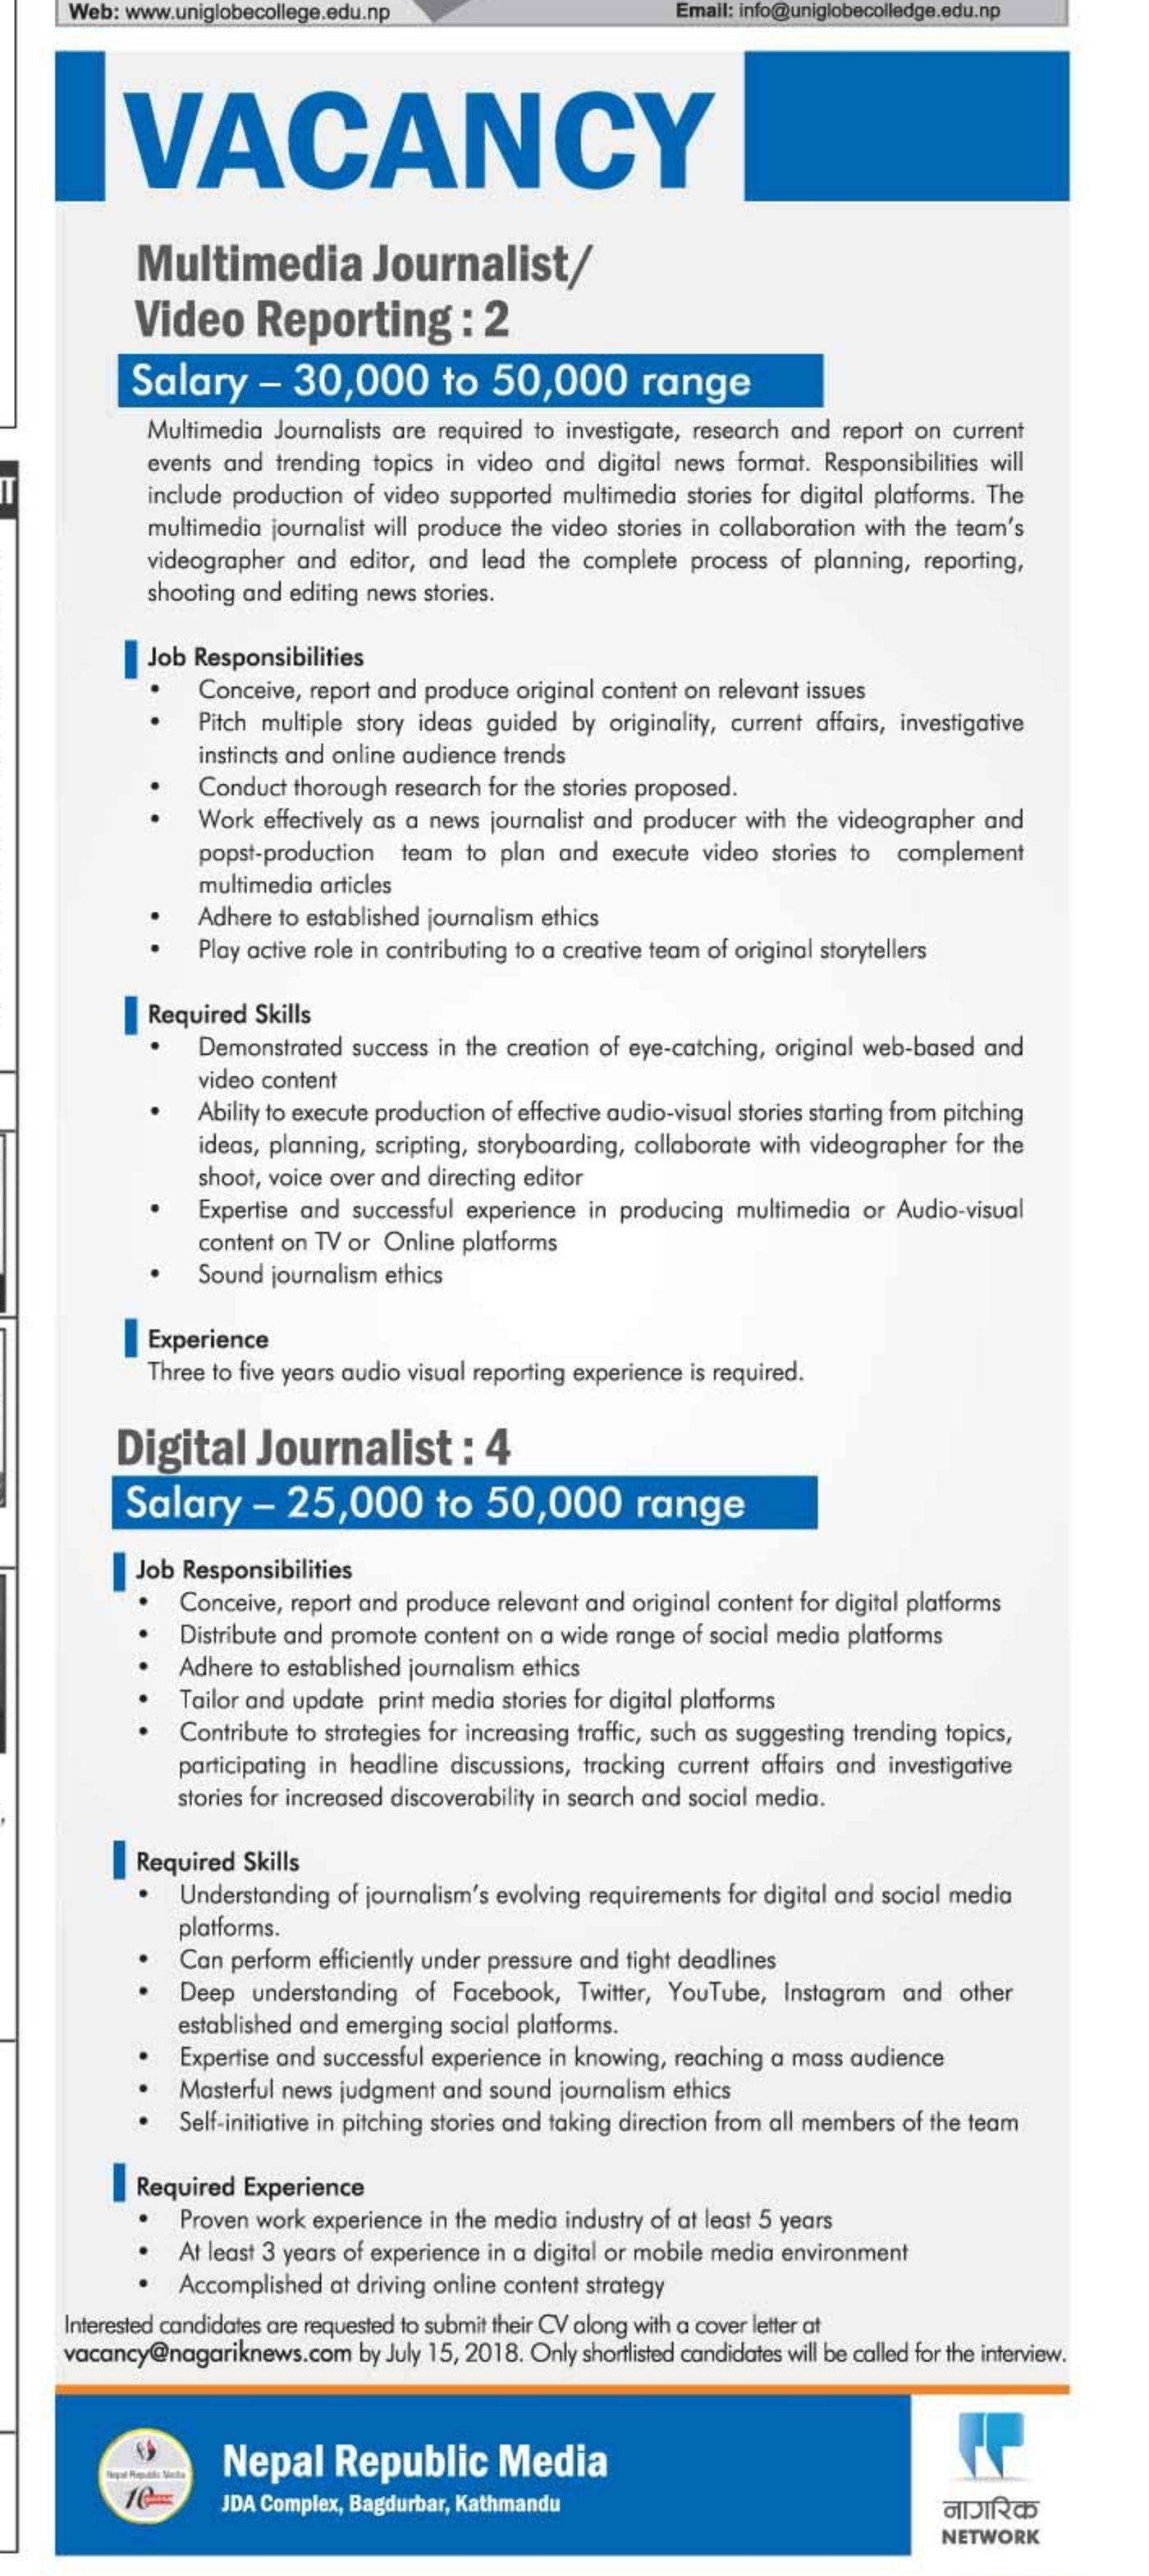 Jobs Nepal - Vacancy - Multimedia Journalist/ Video Reporting (2